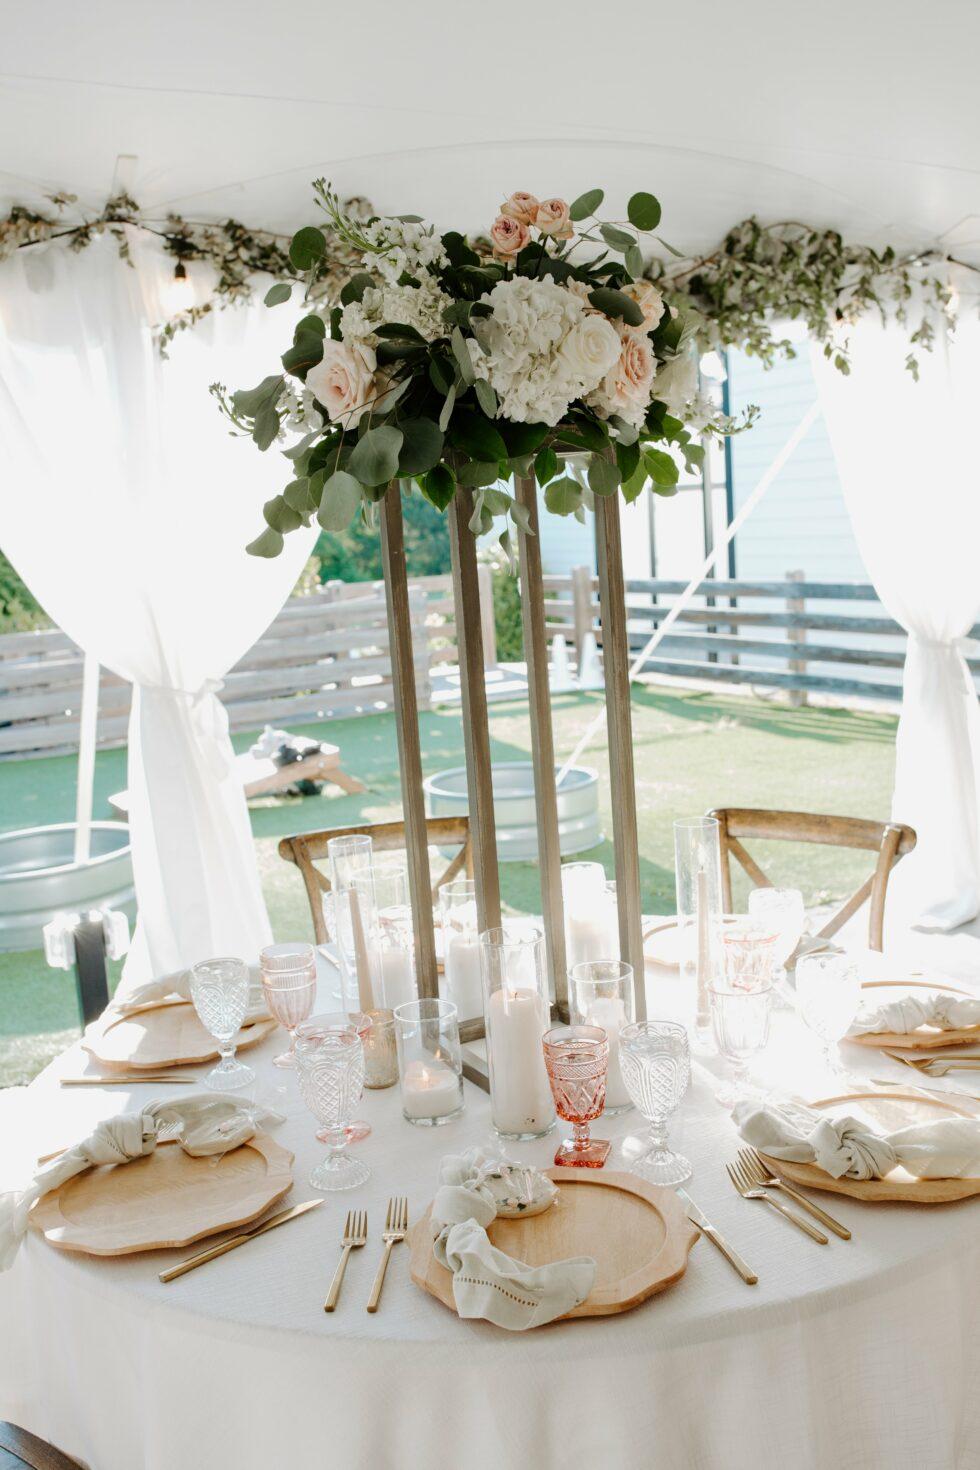 Spring-Wedding-at-Summerfield-Farms-Rachel-and-Brian-24